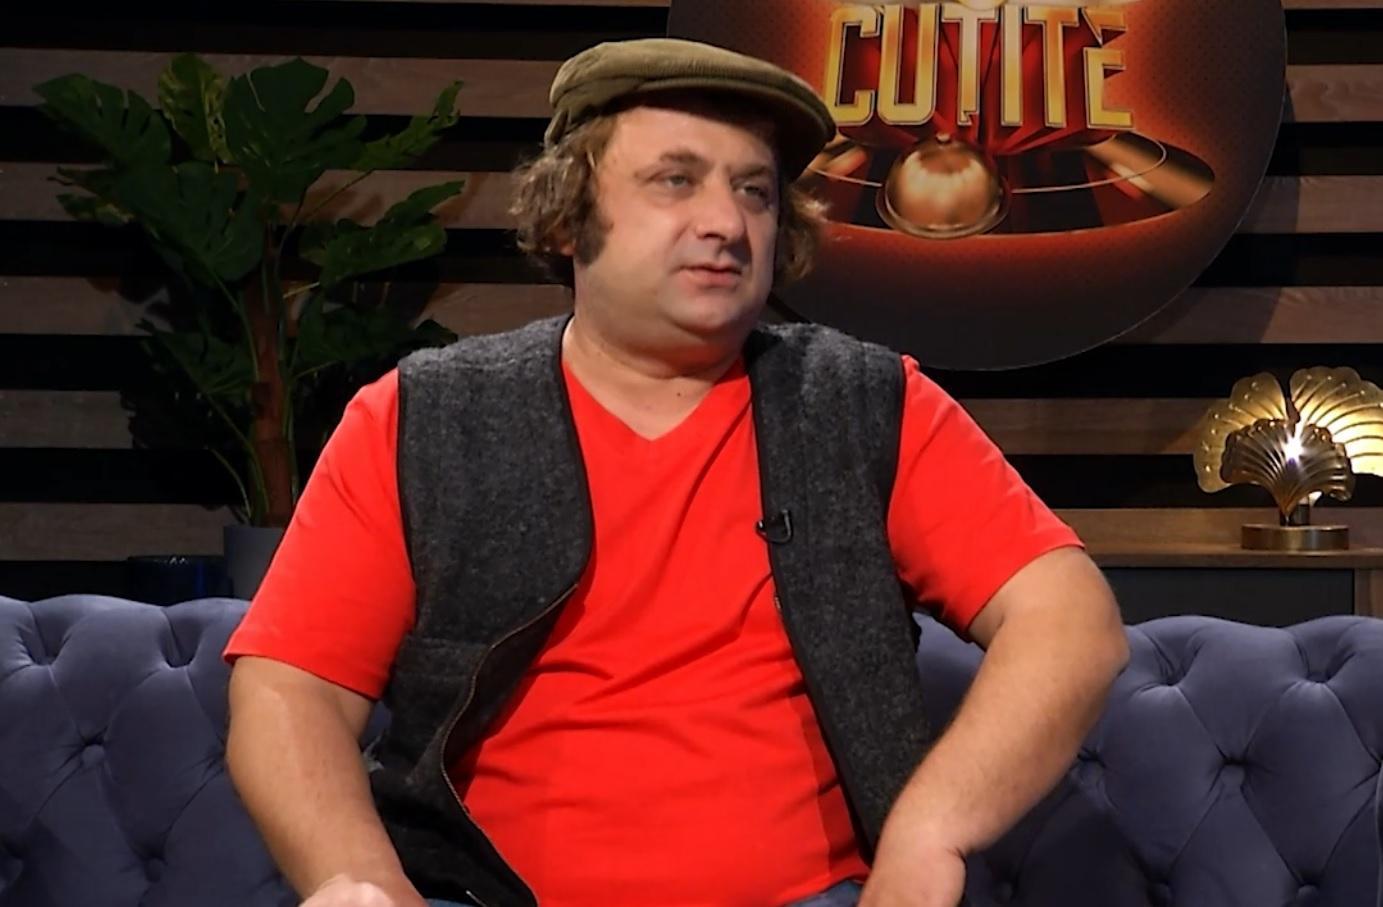 Marius Damian în tricou roșu